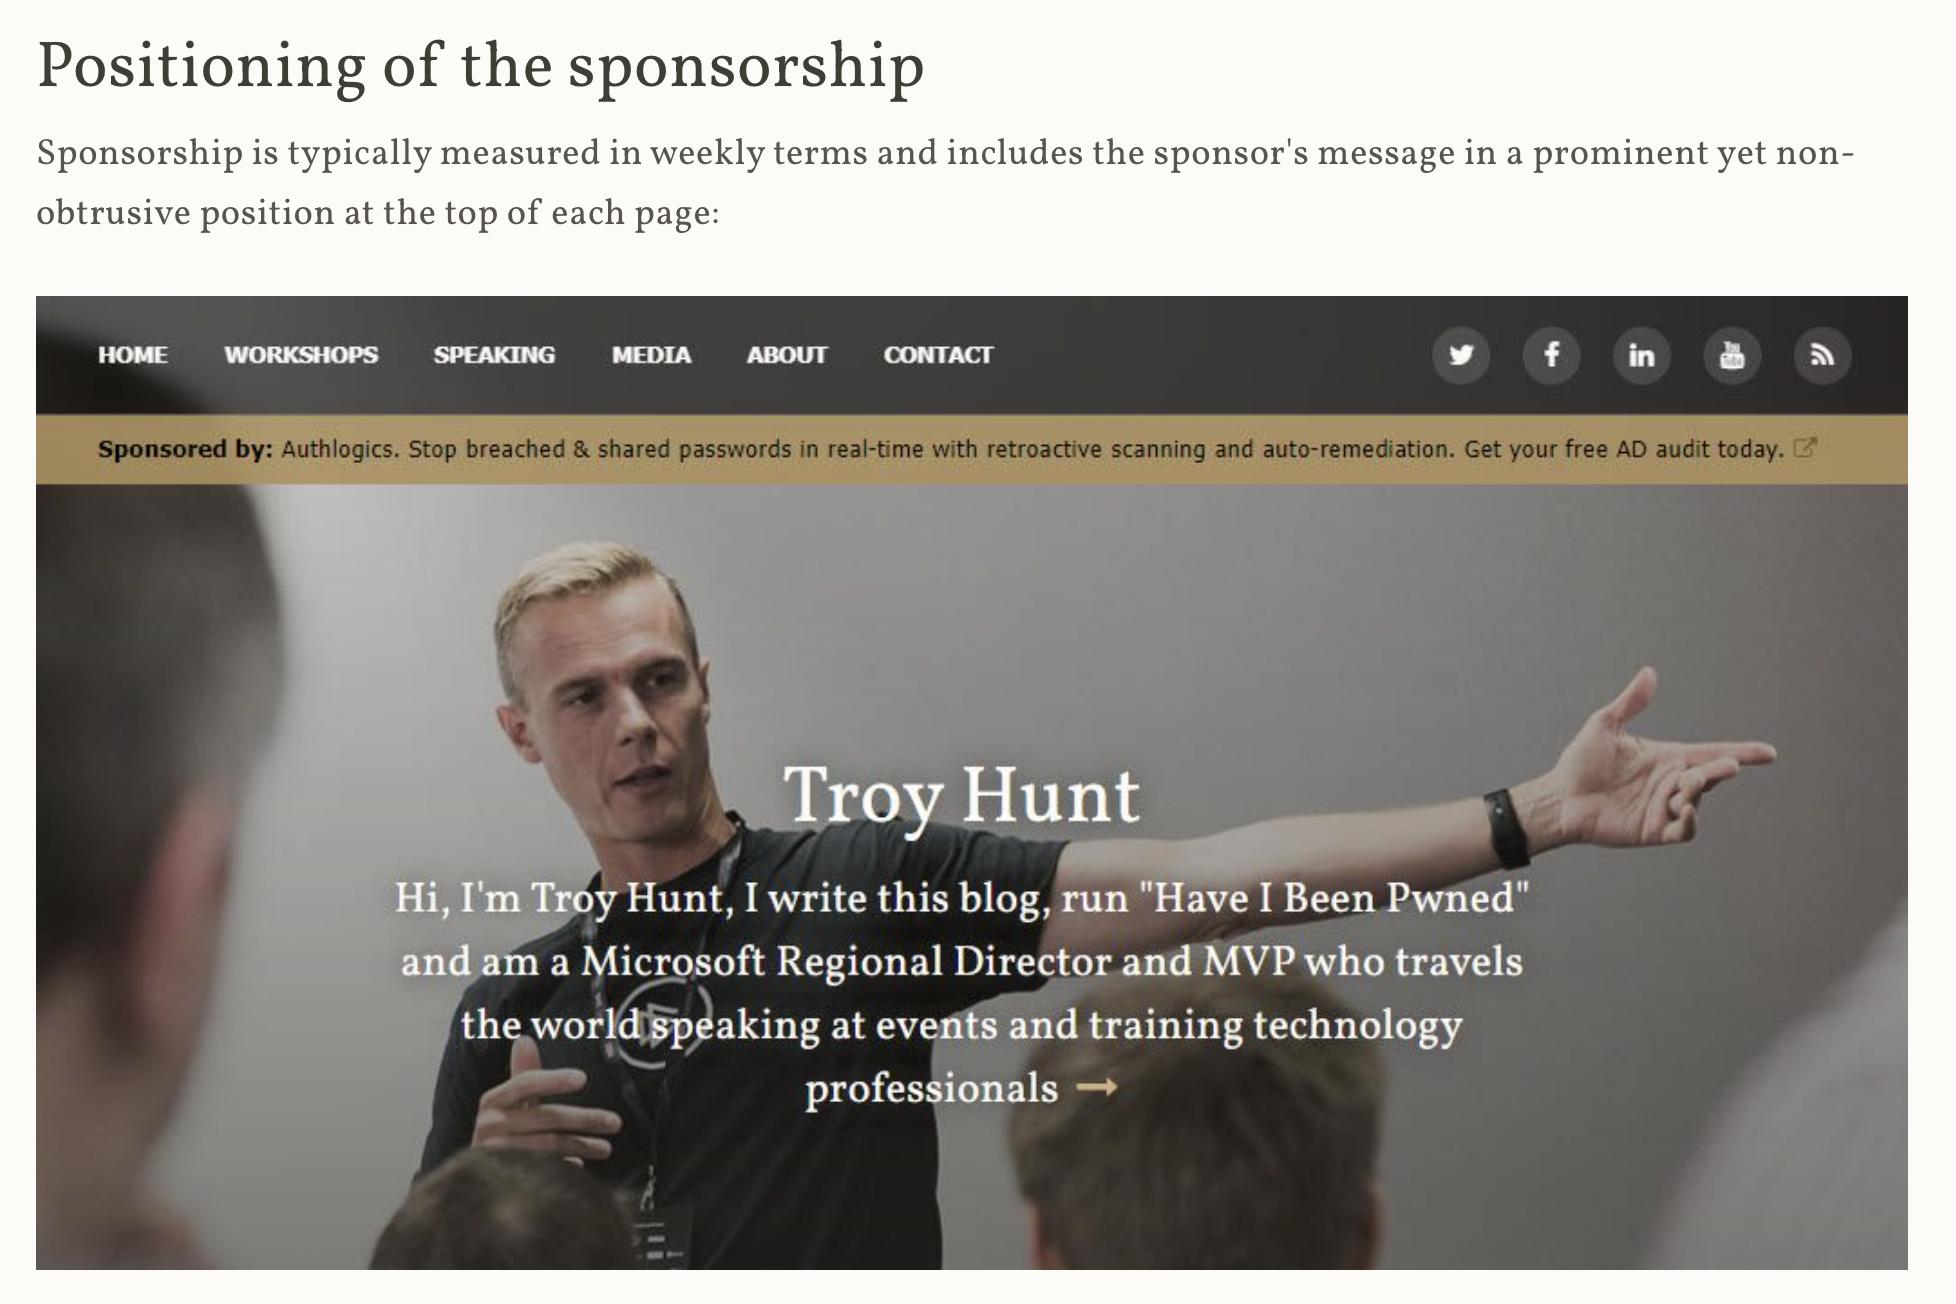 troy hunt sponsorship example